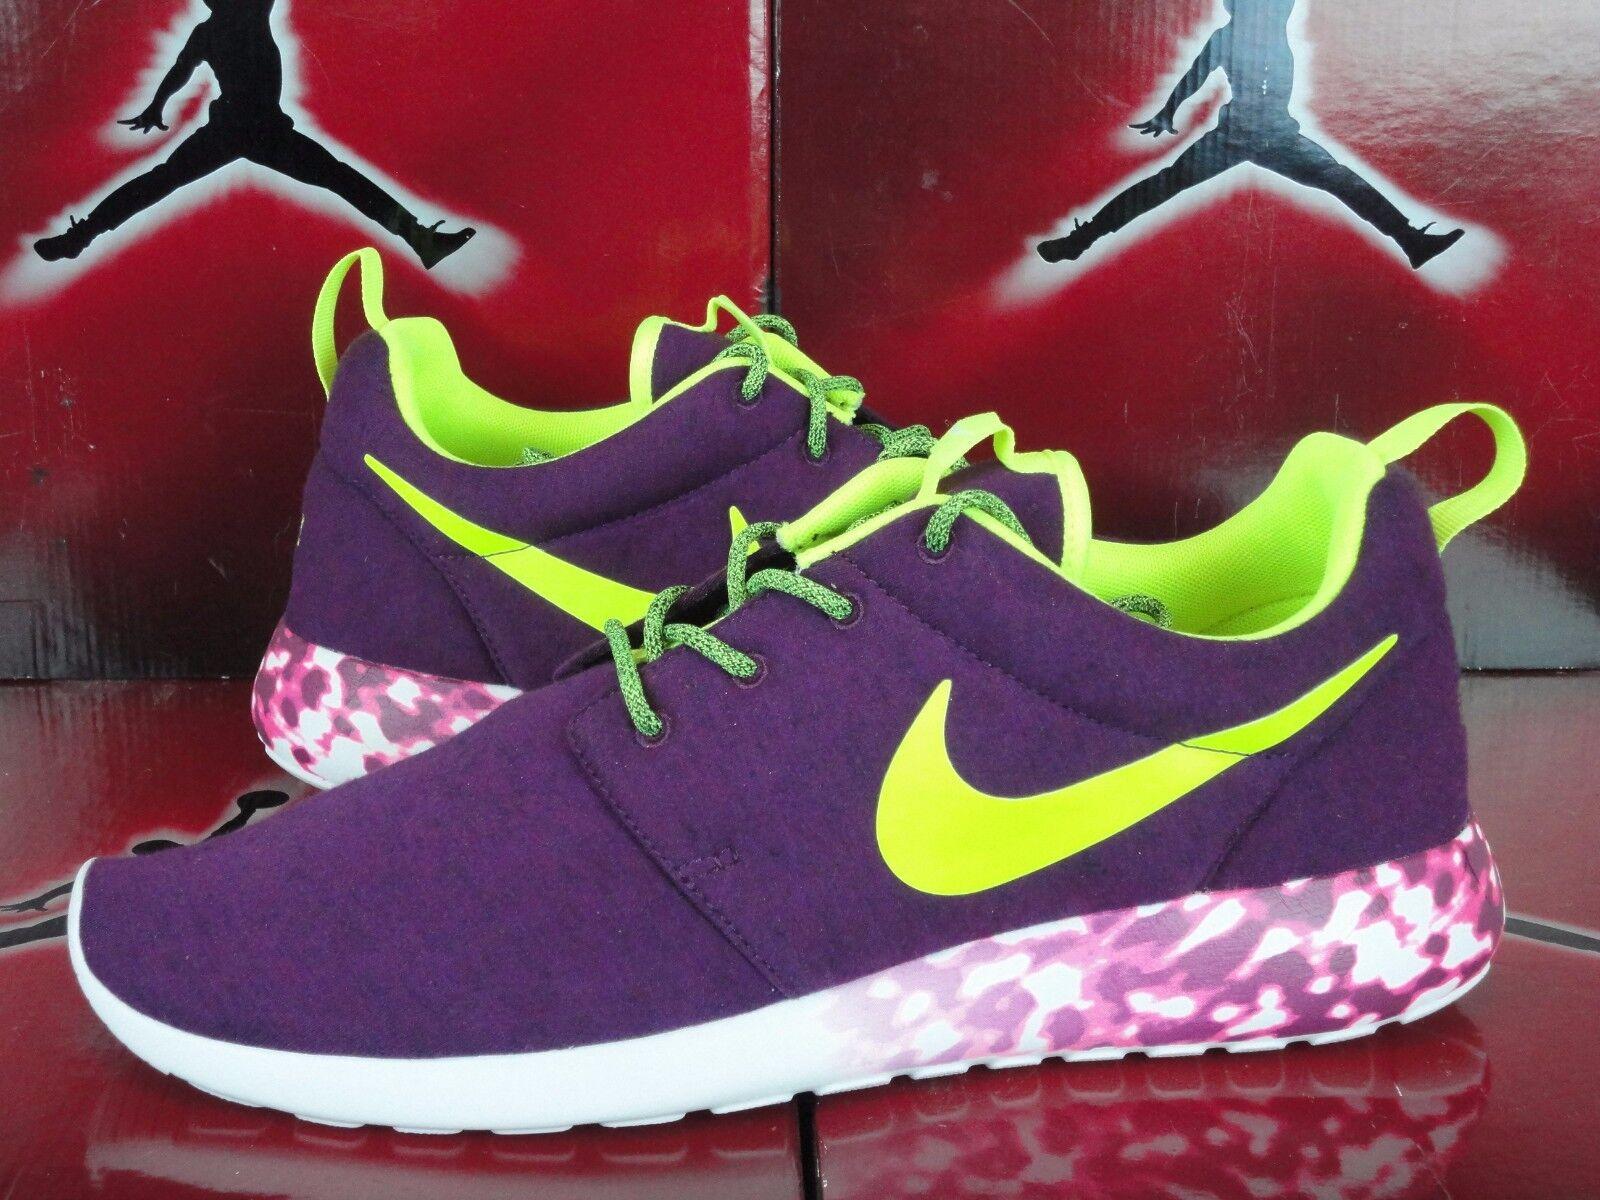 Nike Roshe Run Tech Fleece Purple White Black Rosherun SZ 11 NikeiD ID 1